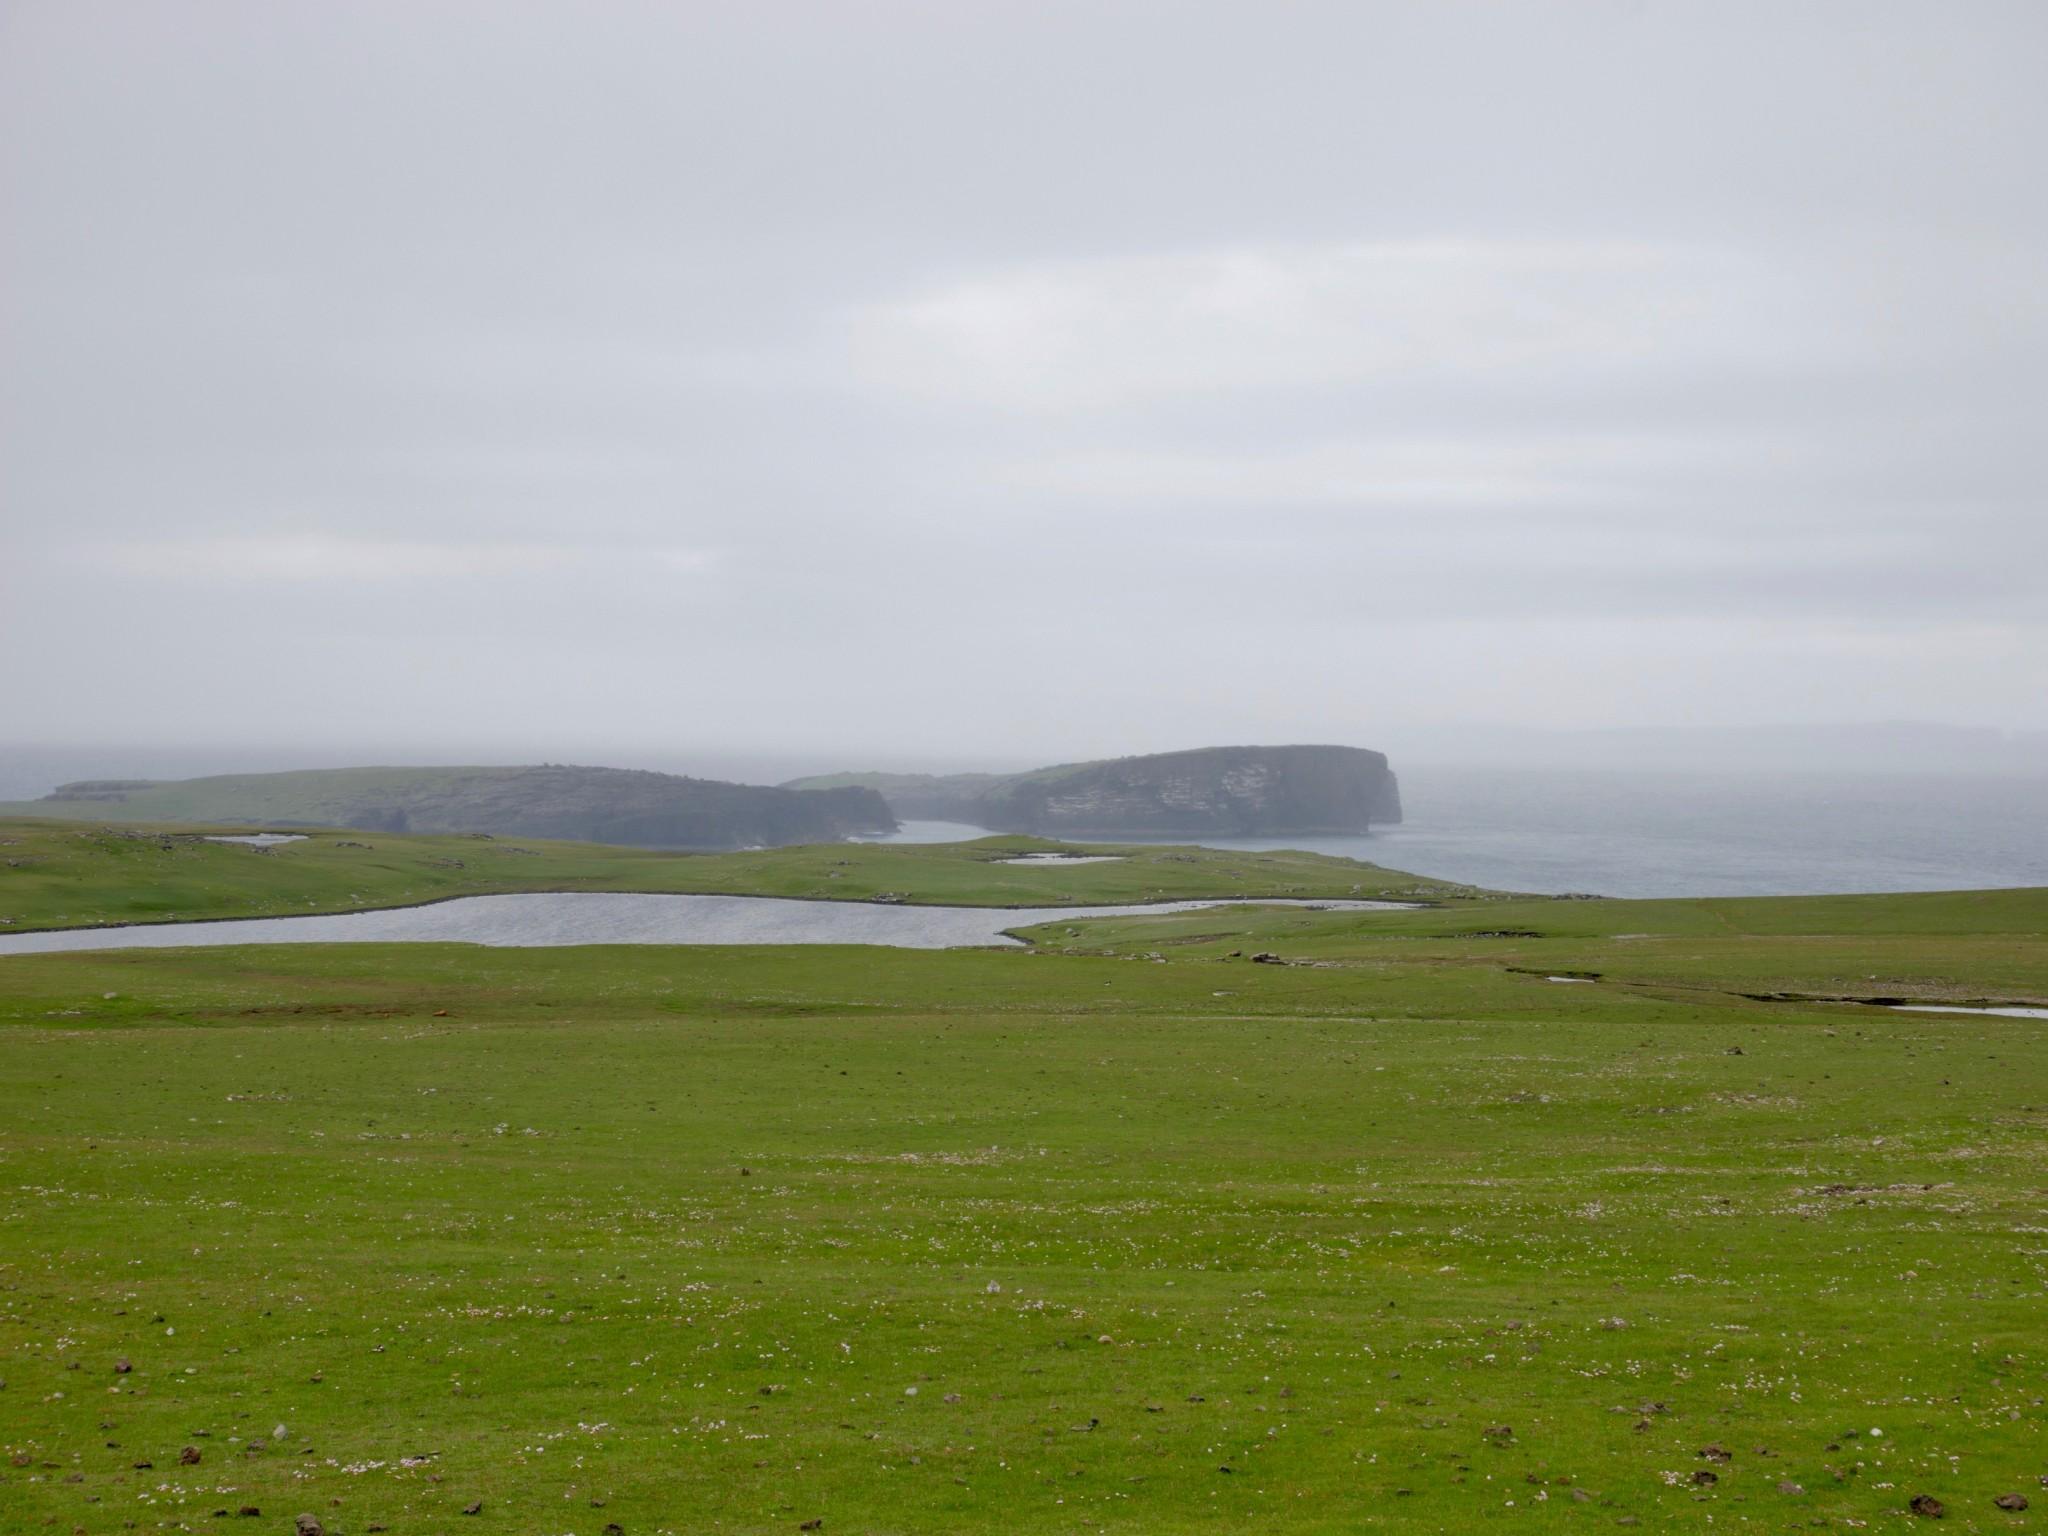 More cliffs